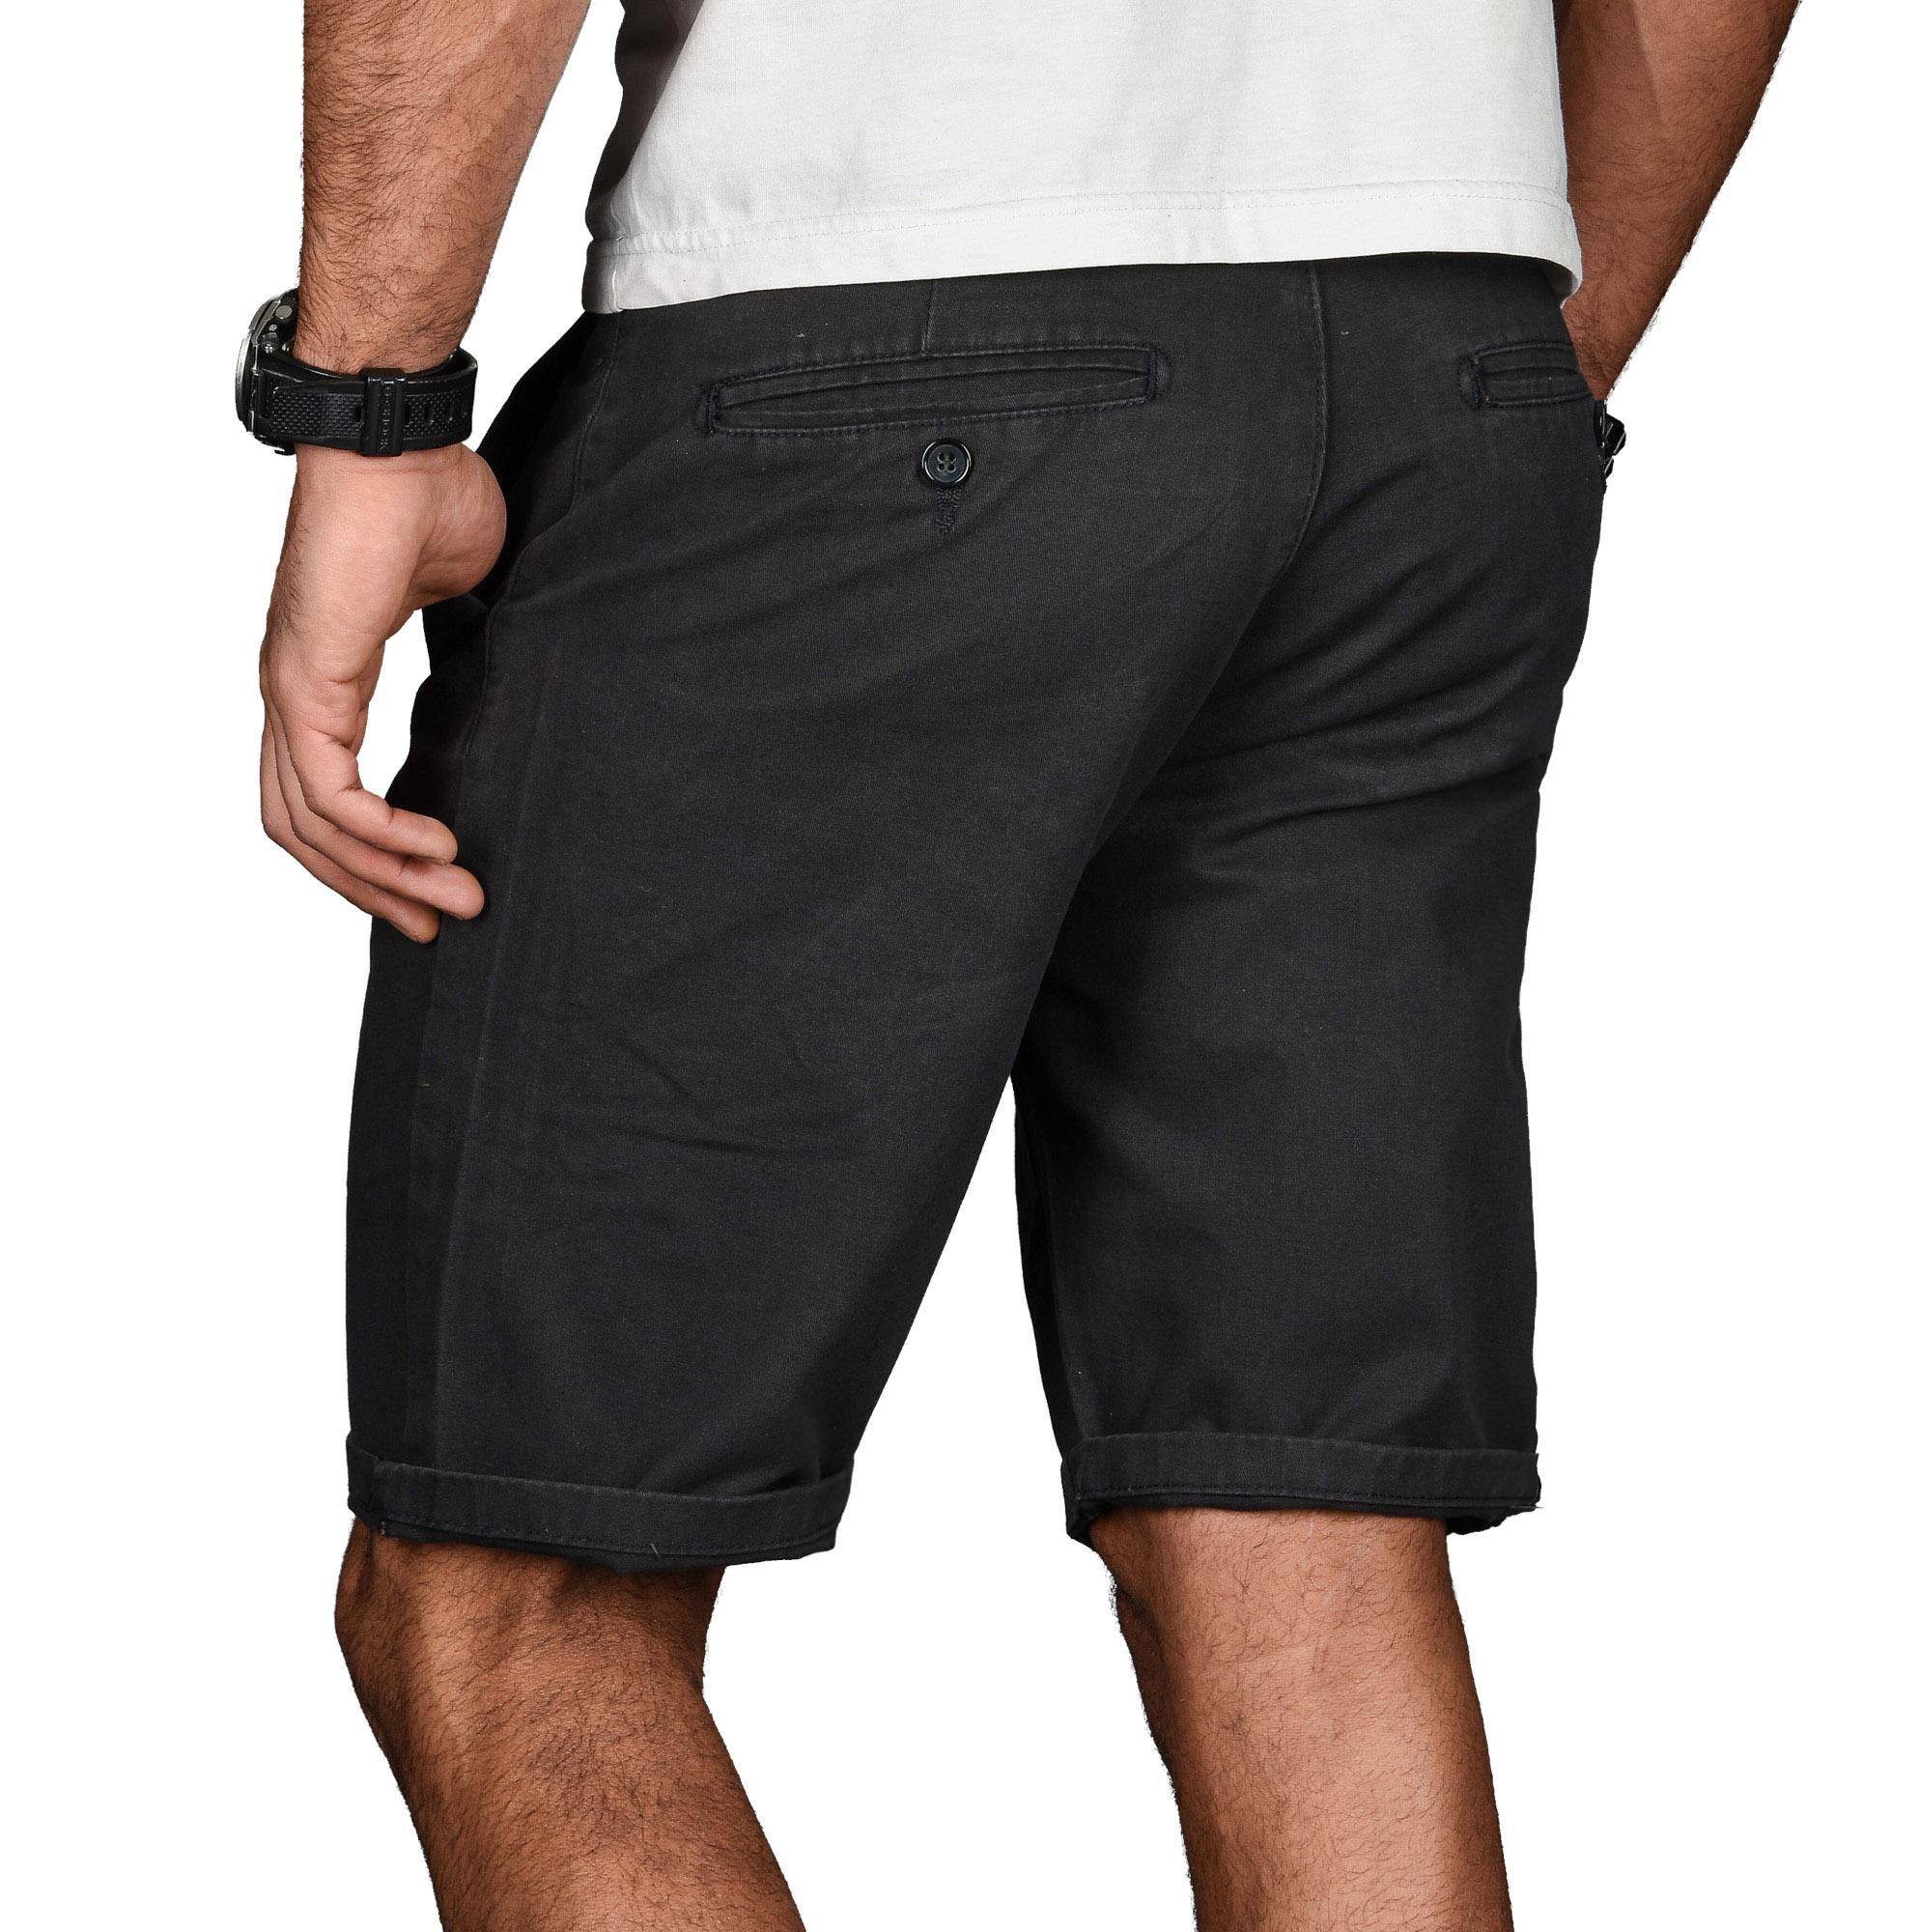 A-Salvarini-Herren-Shorts-kurze-Sommer-Hose-mit-Guertel-Short-Bermuda-NEU-AS096 Indexbild 15